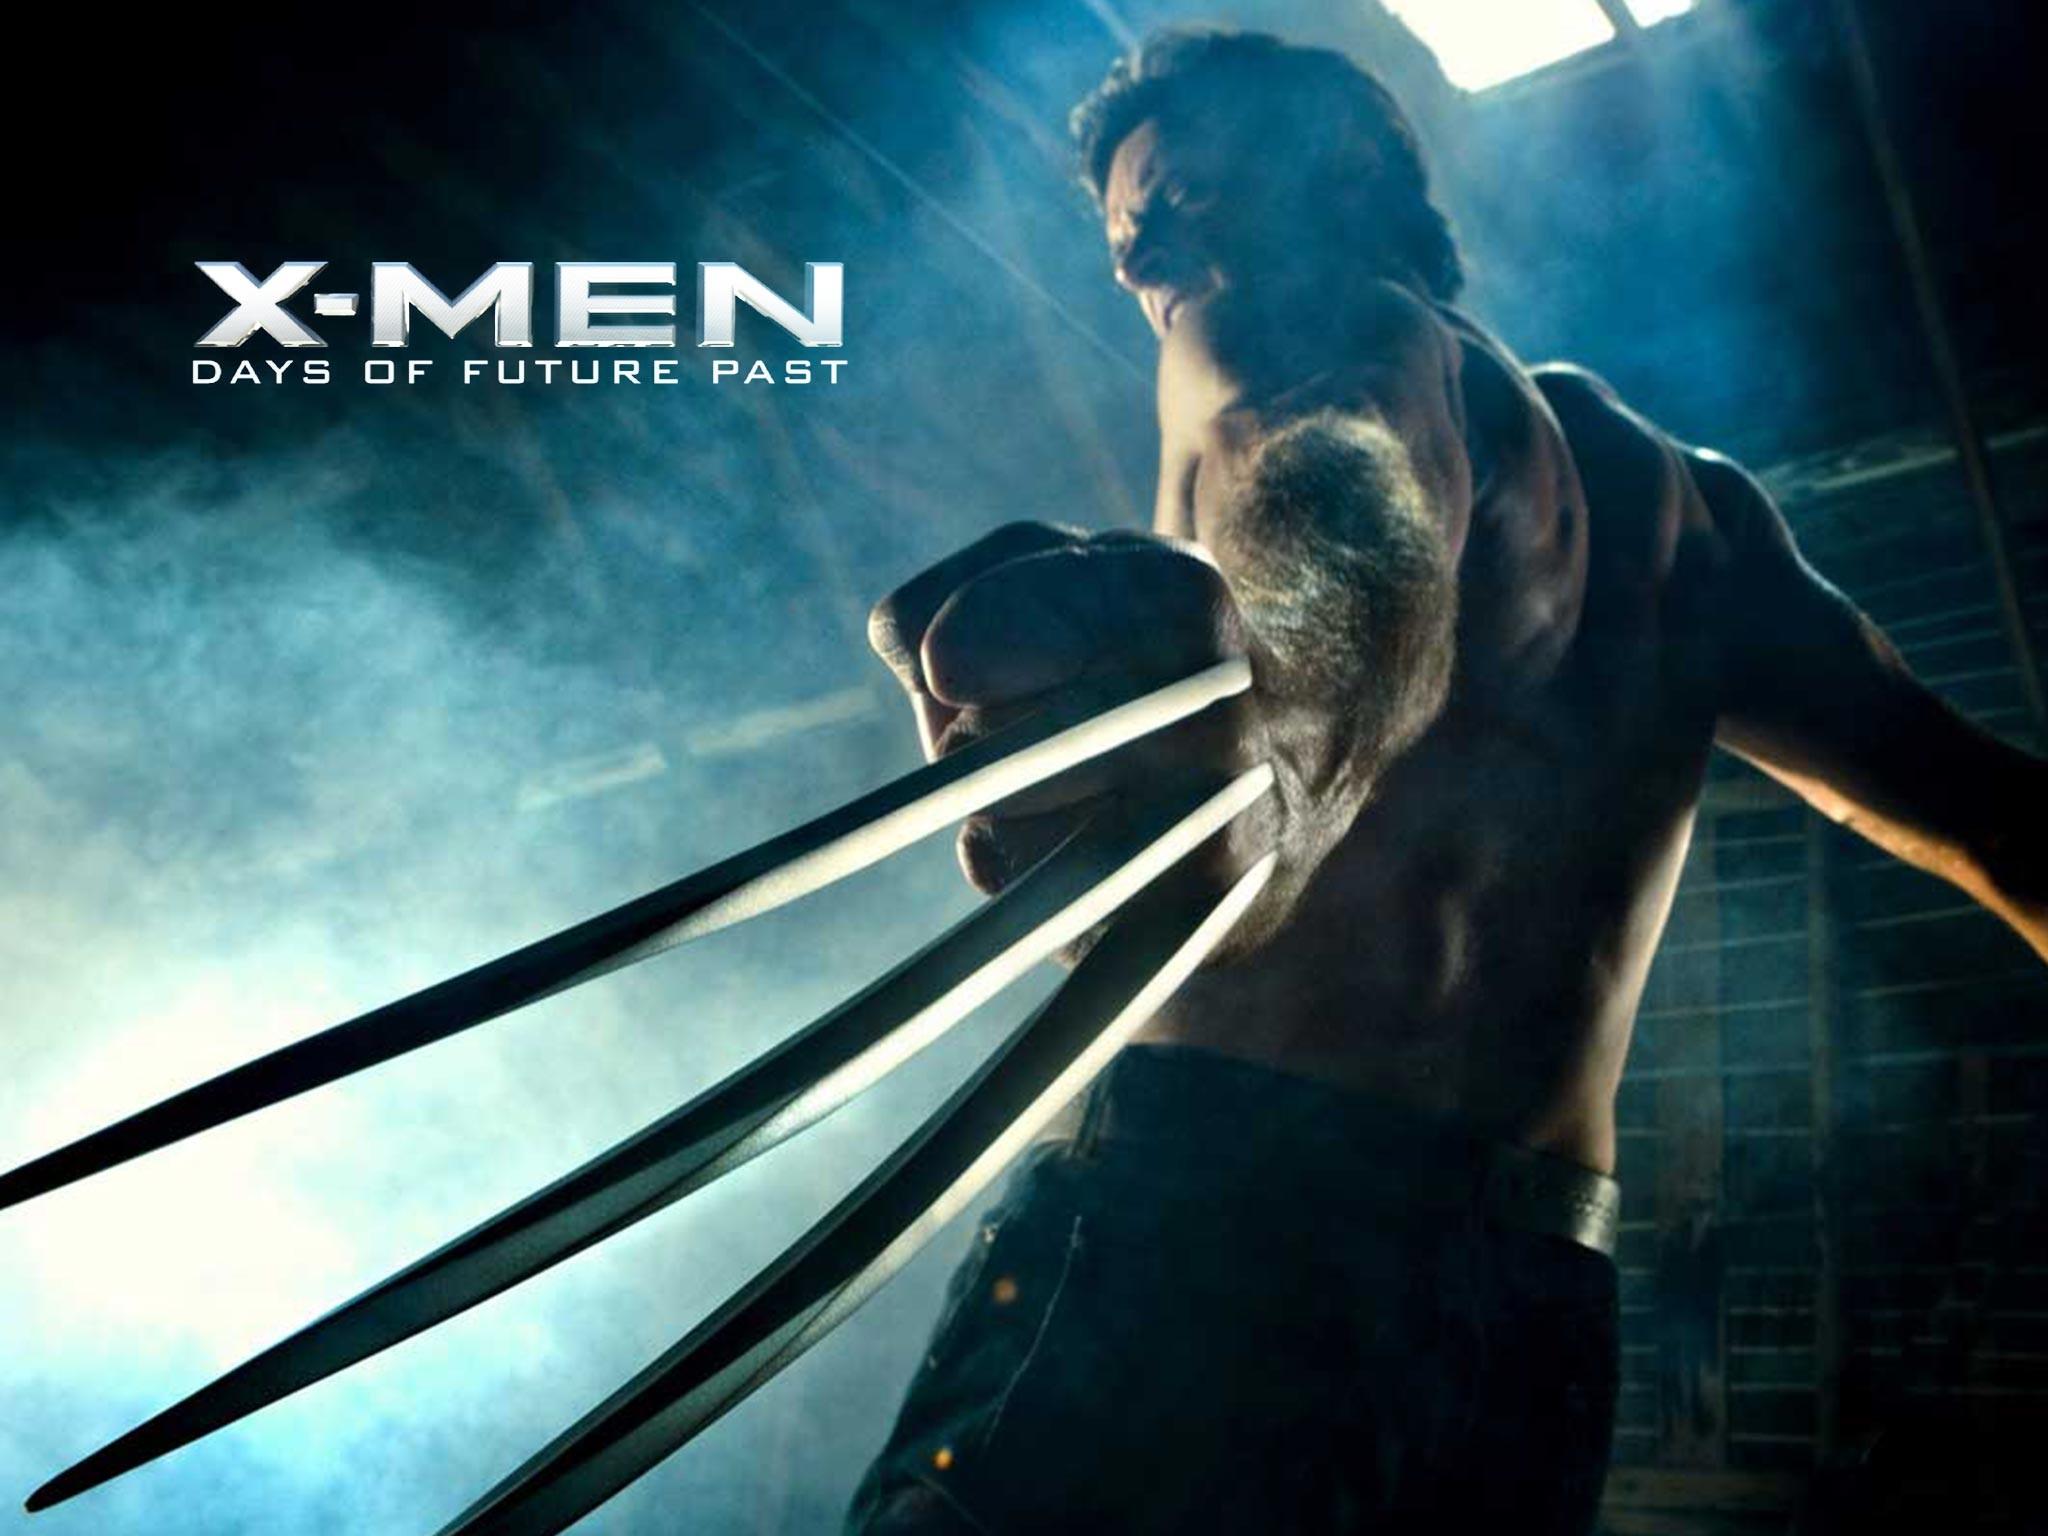 … X-Men-2014-wolverine-iPad-wallpaper-Retina